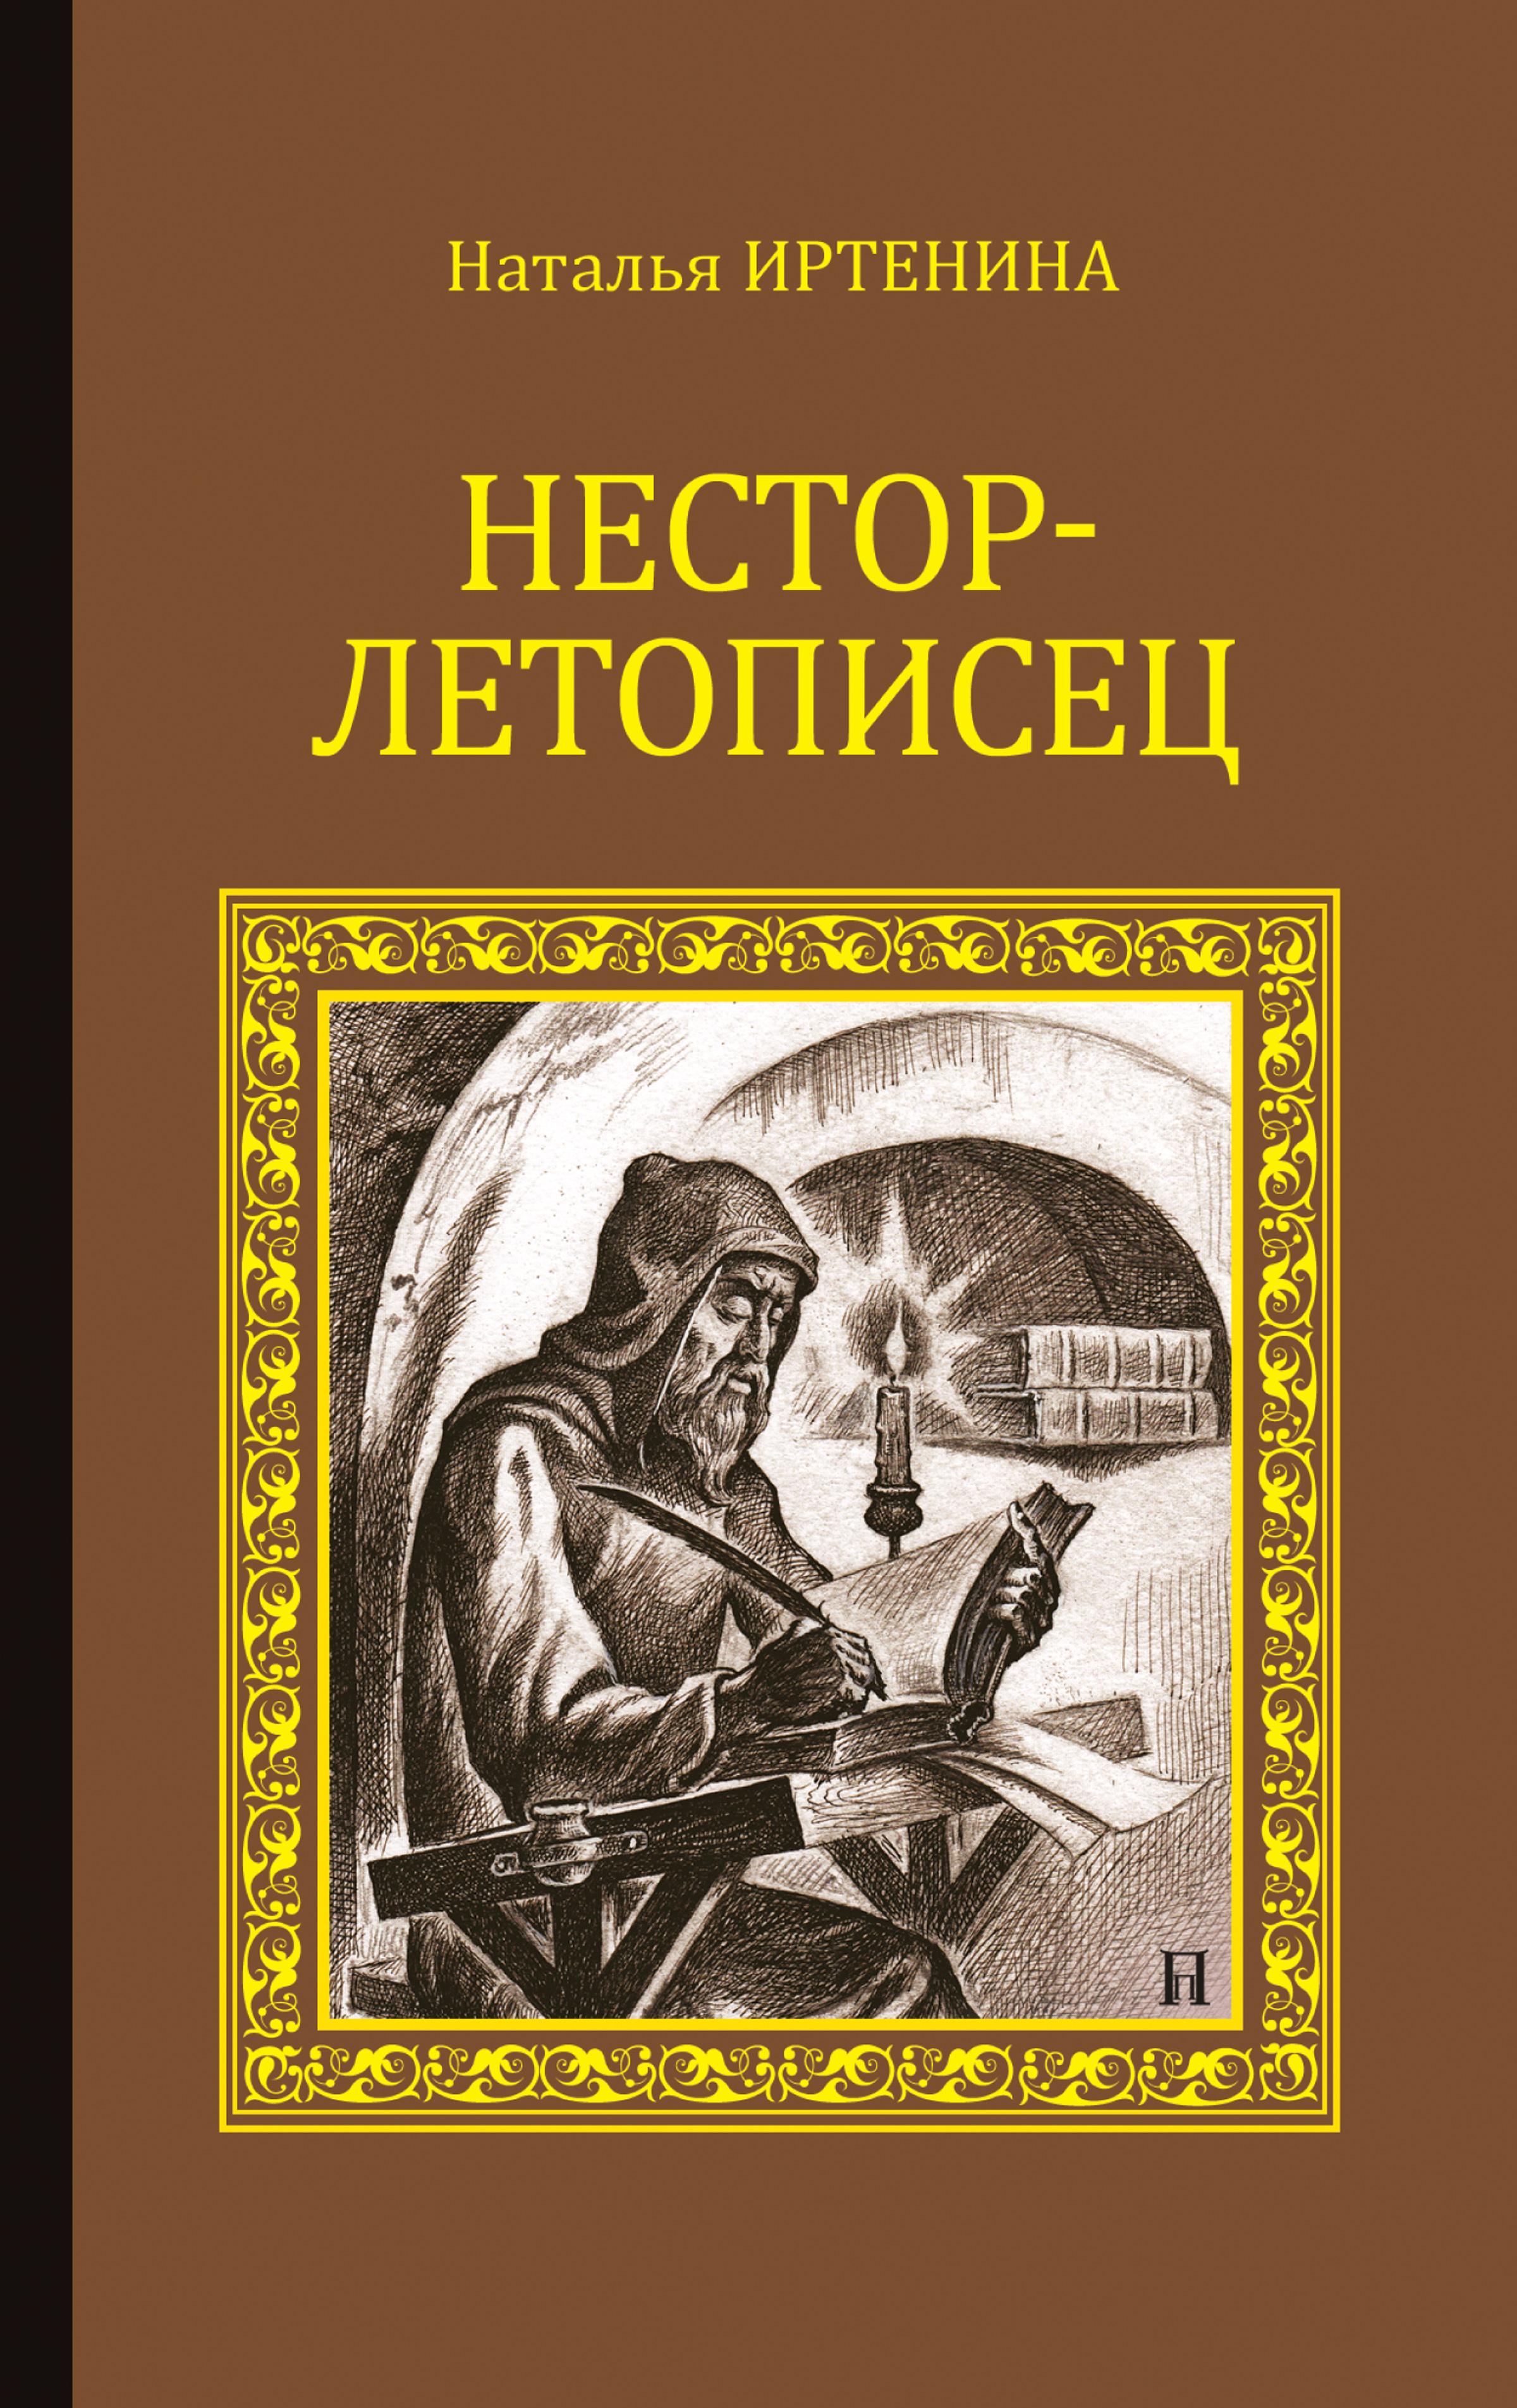 цена на Наталья Иртенина Нестор-летописец